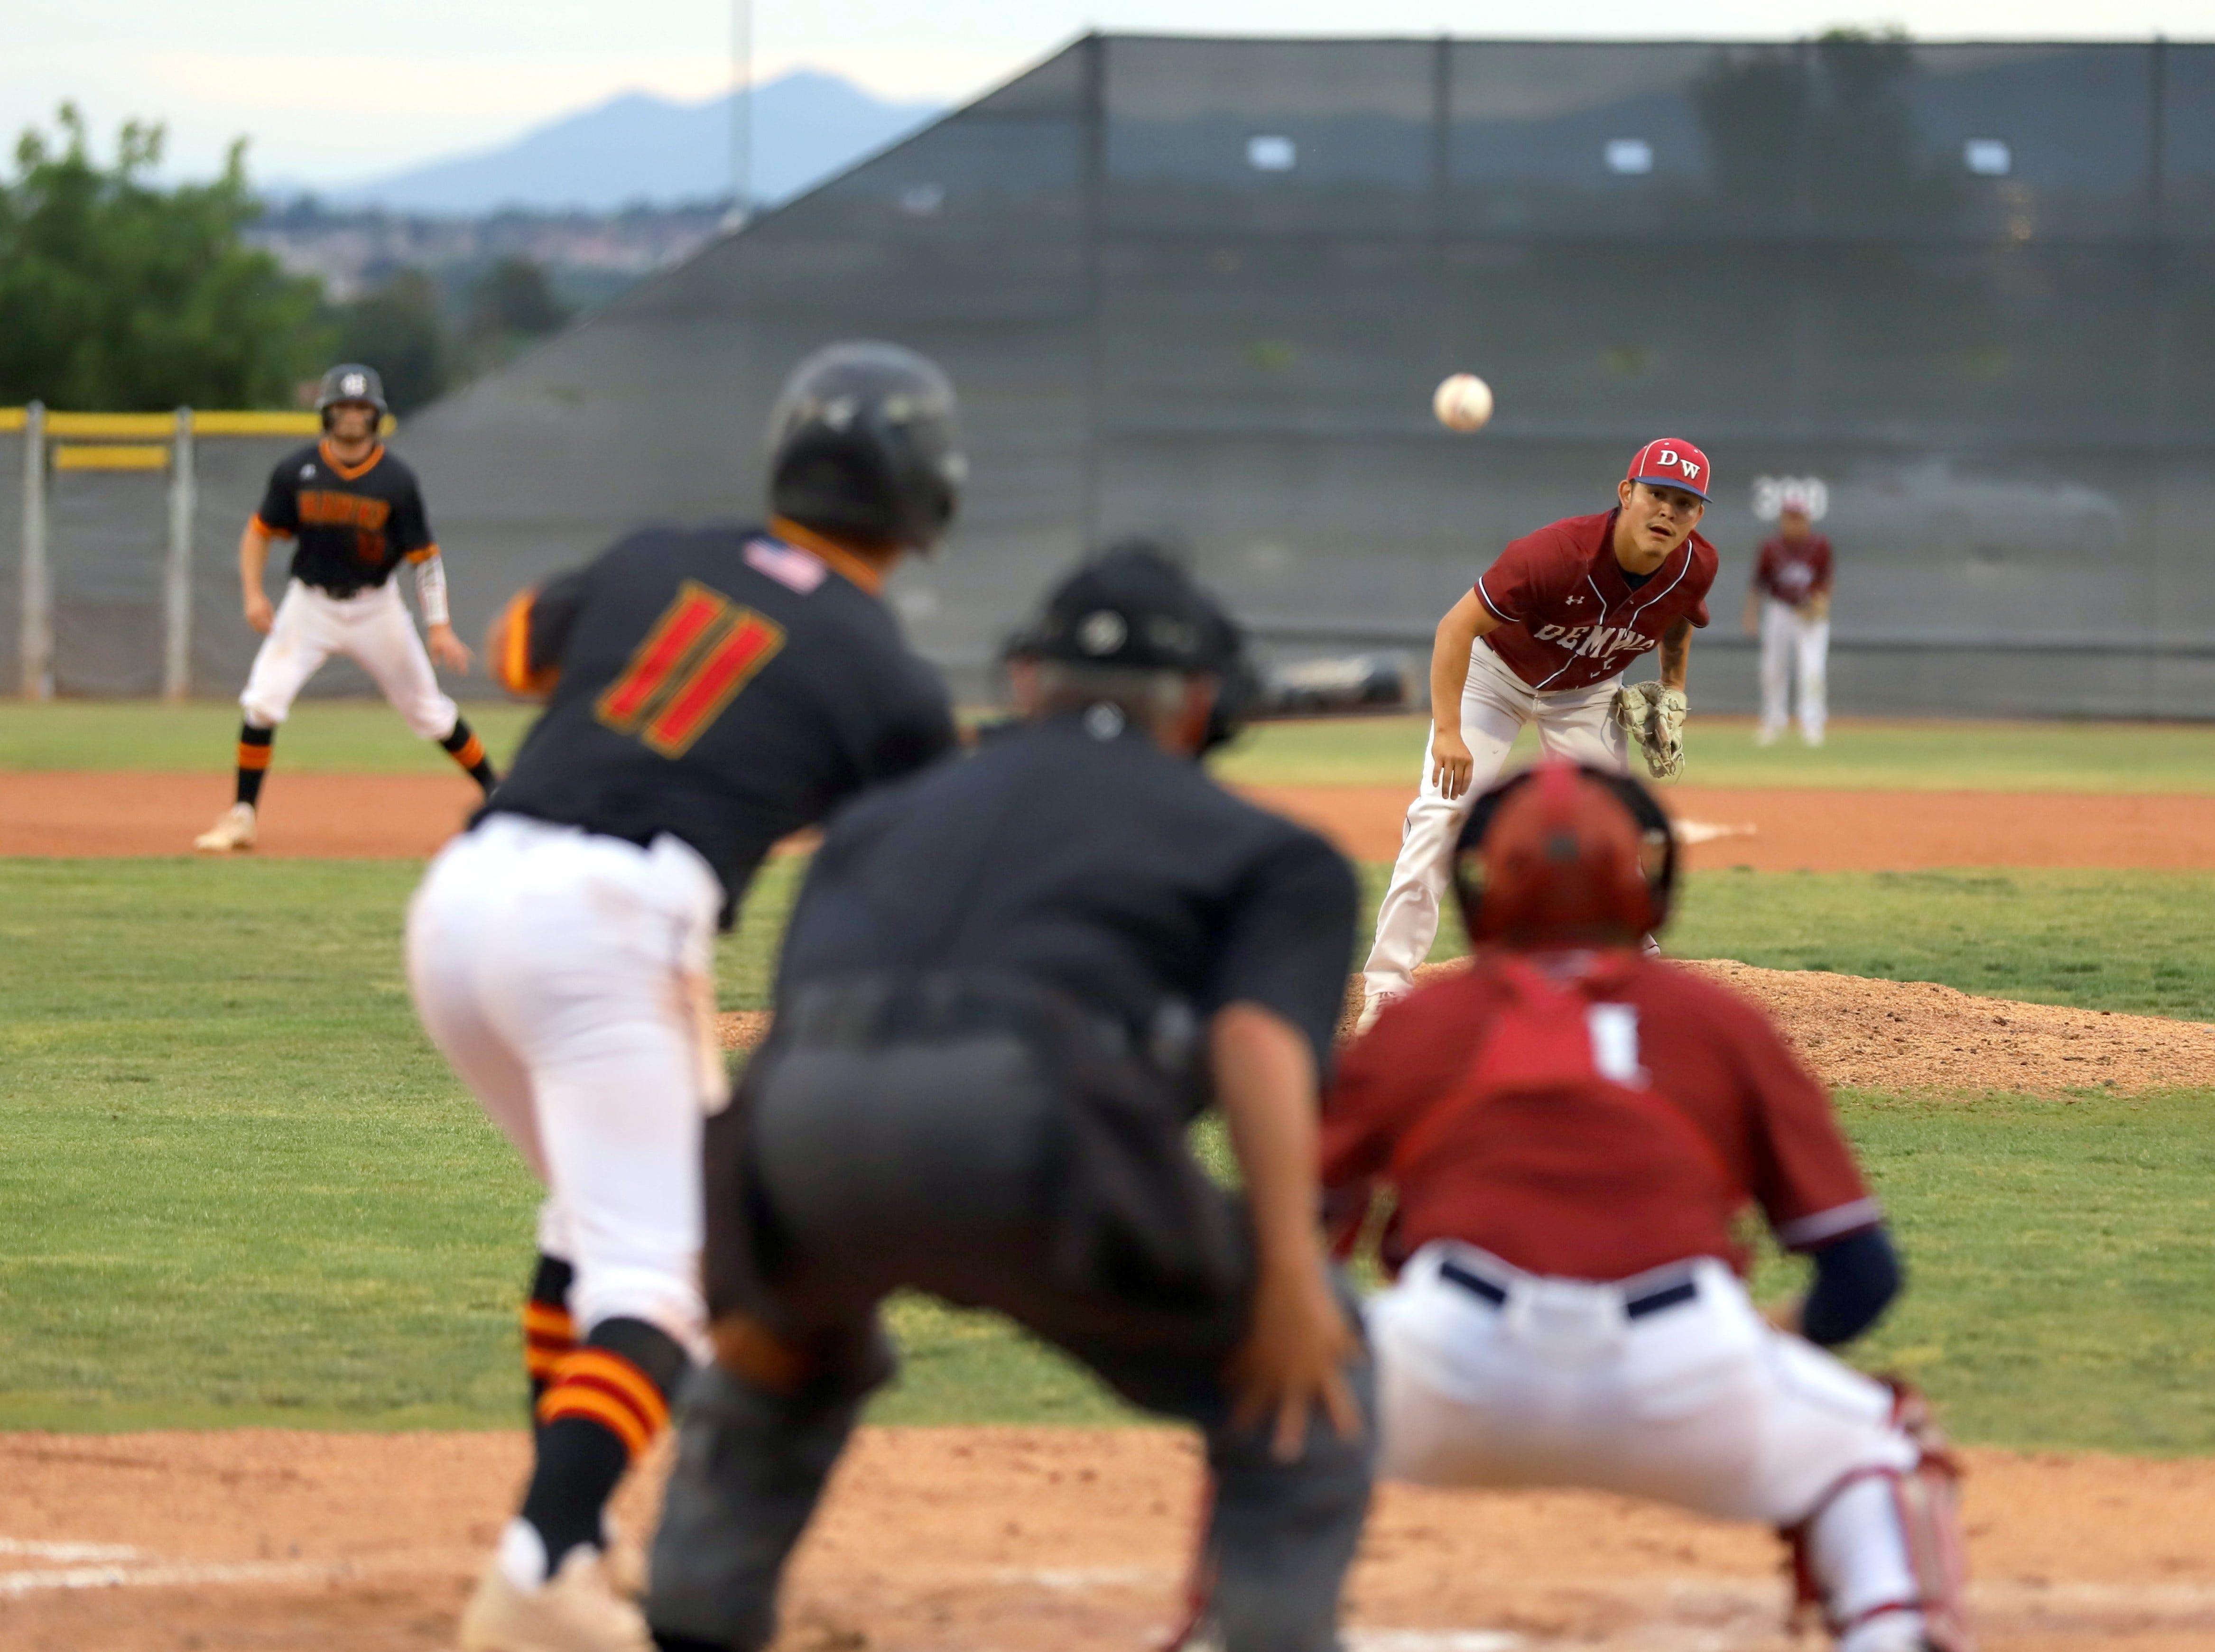 Junior Wildcat pitcher Fernie Munoz peers in after the pitch as Centennial batter Adrian Hernandez squares to bunt.